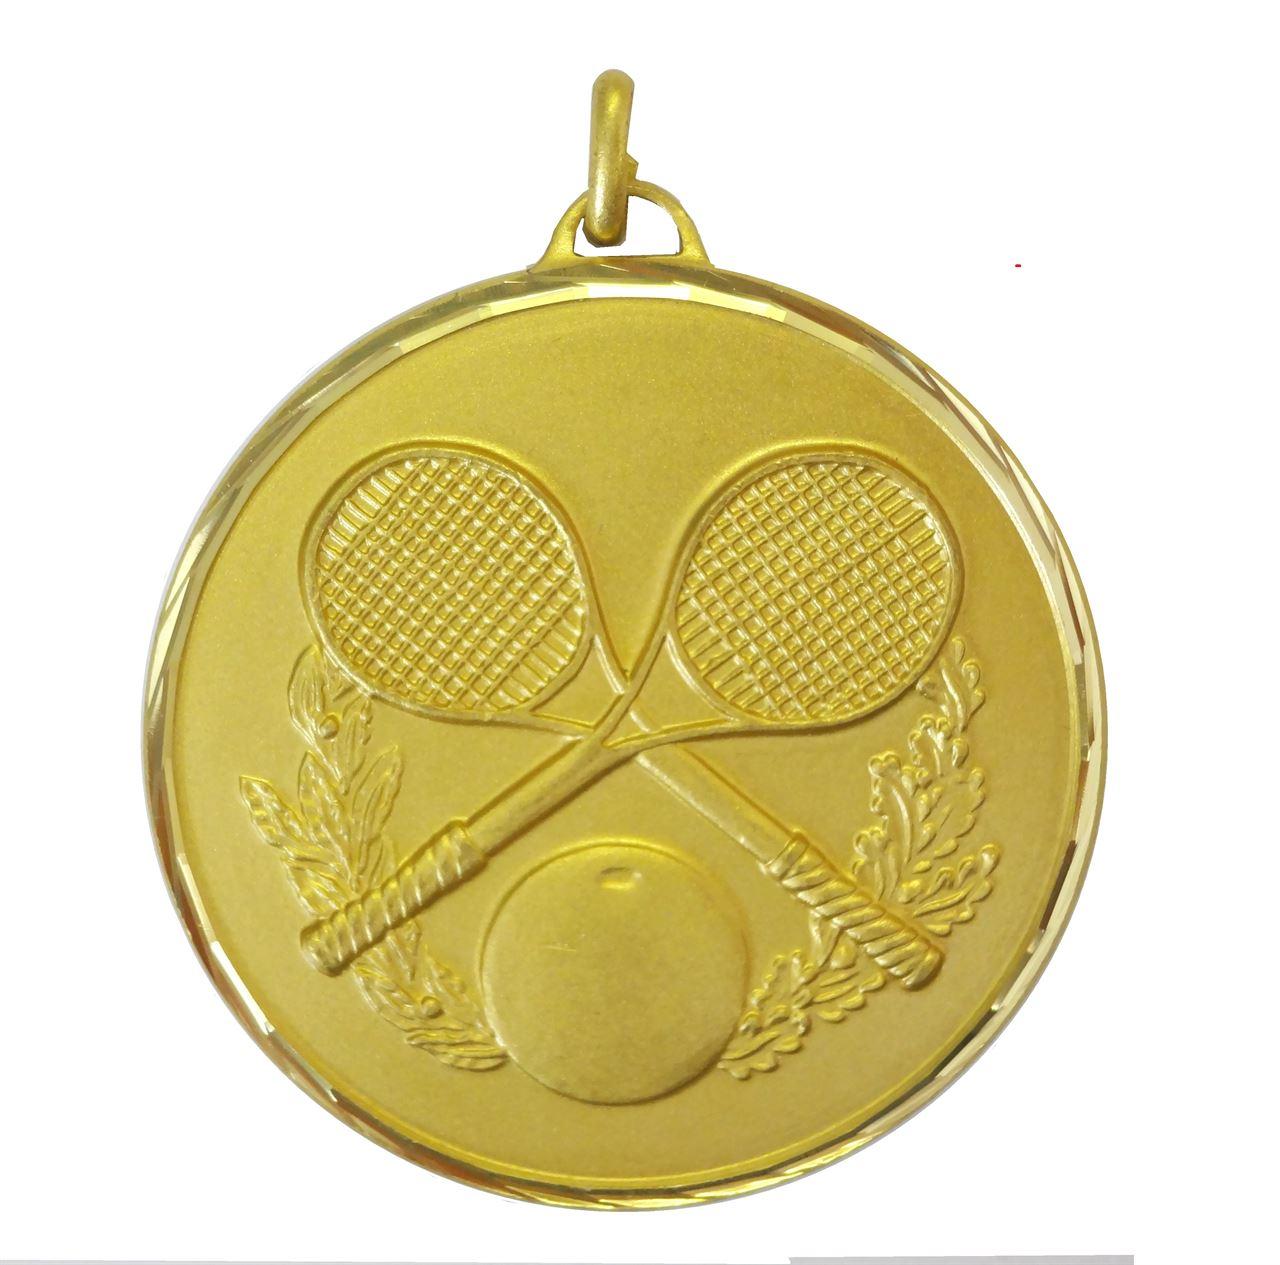 Gold Faceted Squash Medal (size: 50mm) - 368/50G